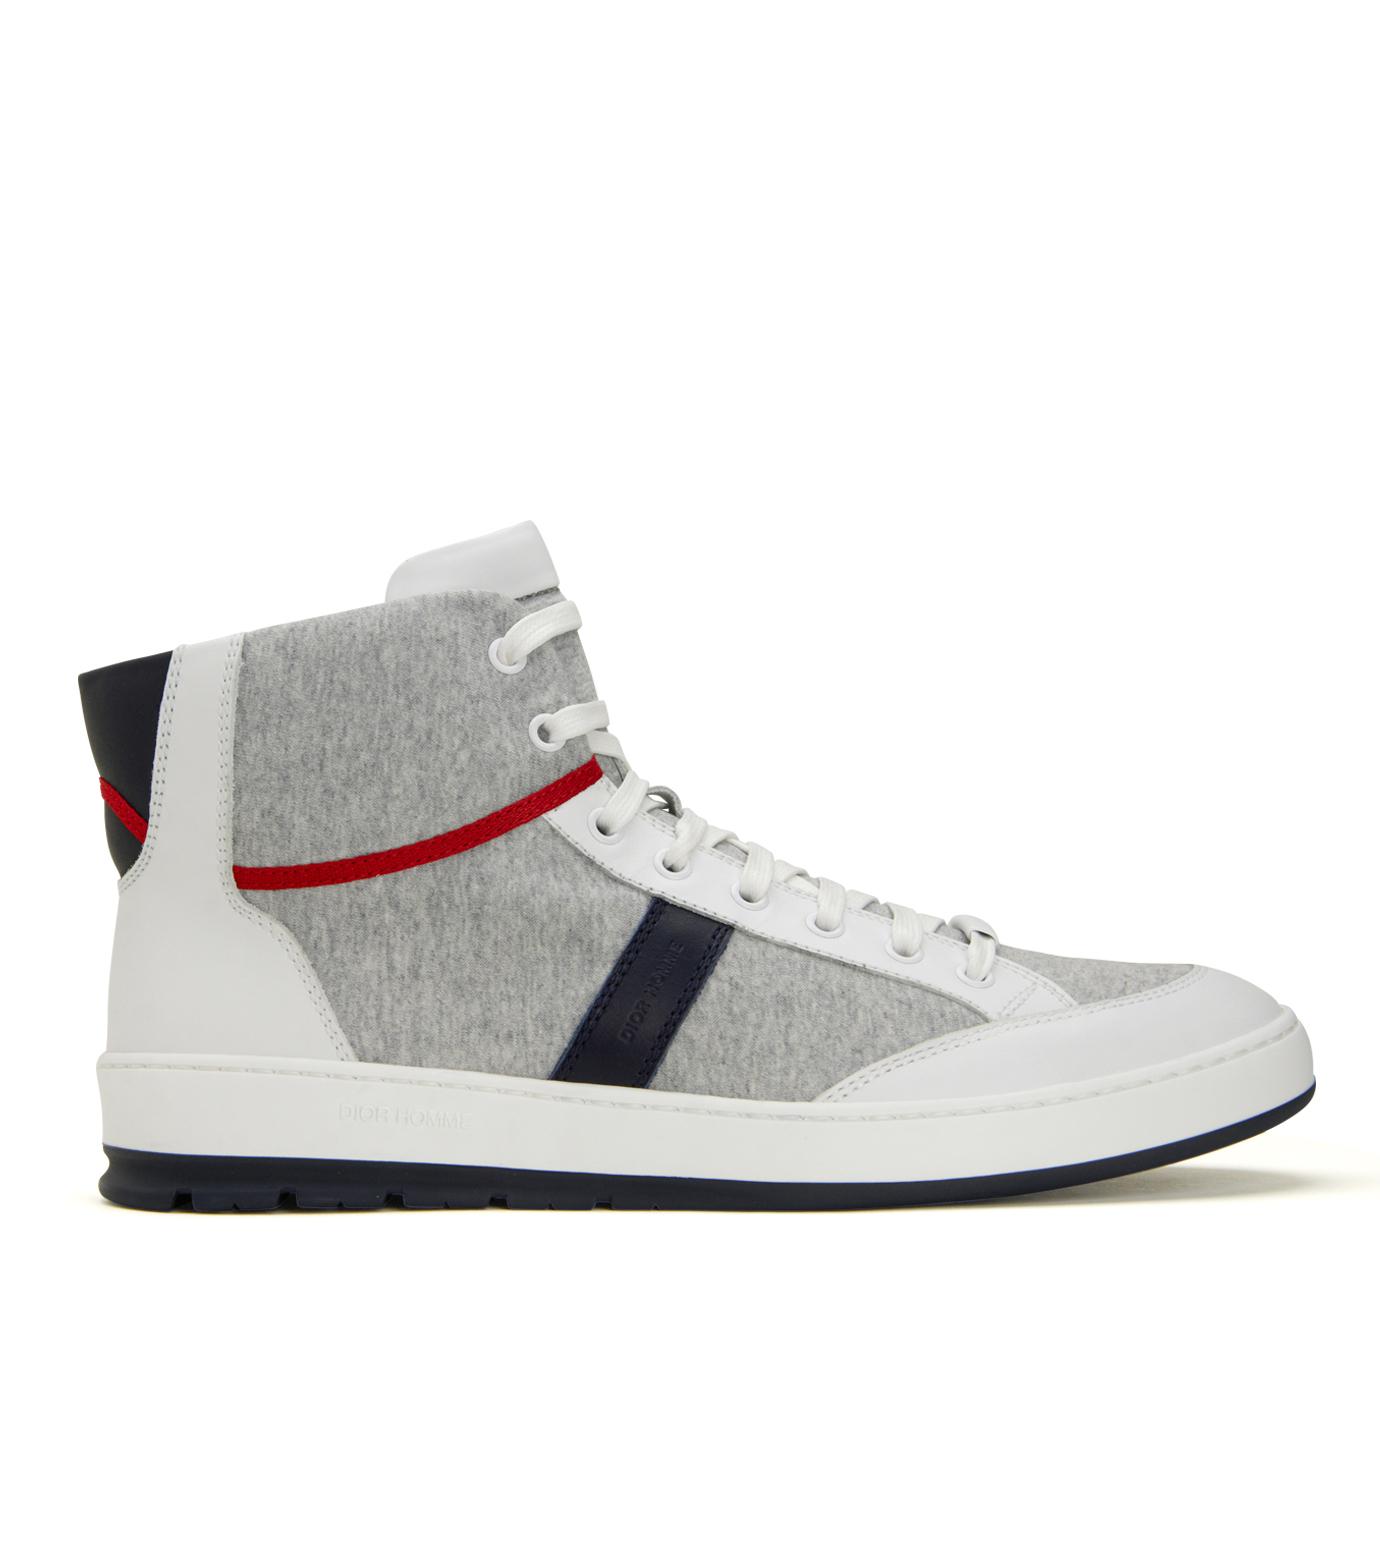 Dior Homme(ディオール オム)のSweat High Sneaker-WHITE-3SH007 拡大詳細画像1